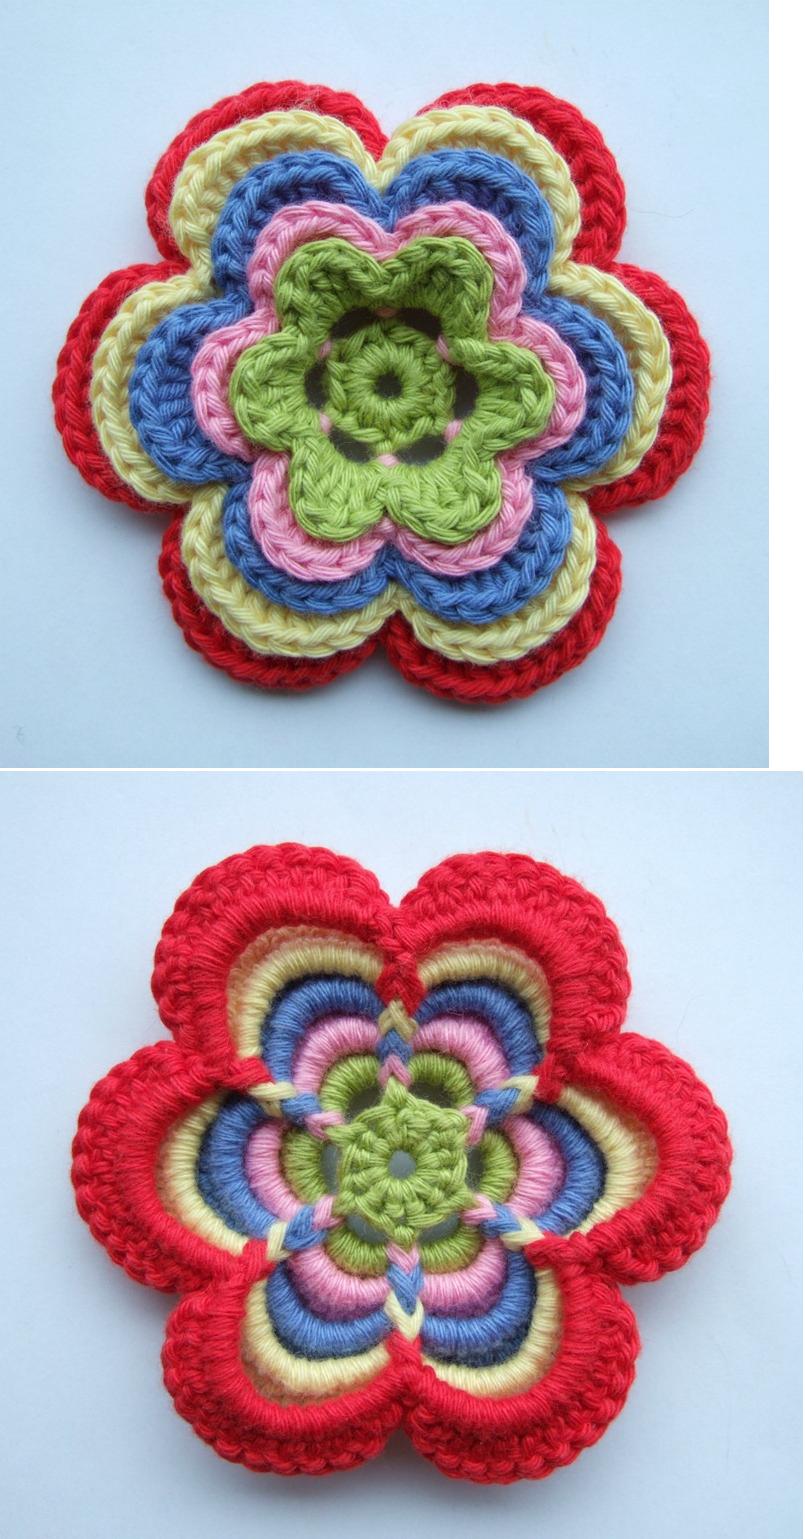 Beautiful crochet flower full tutorial at httpsolgrim beautiful crochet flower full tutorial at httpsolgrimspot201106hekleblomstml izmirmasajfo